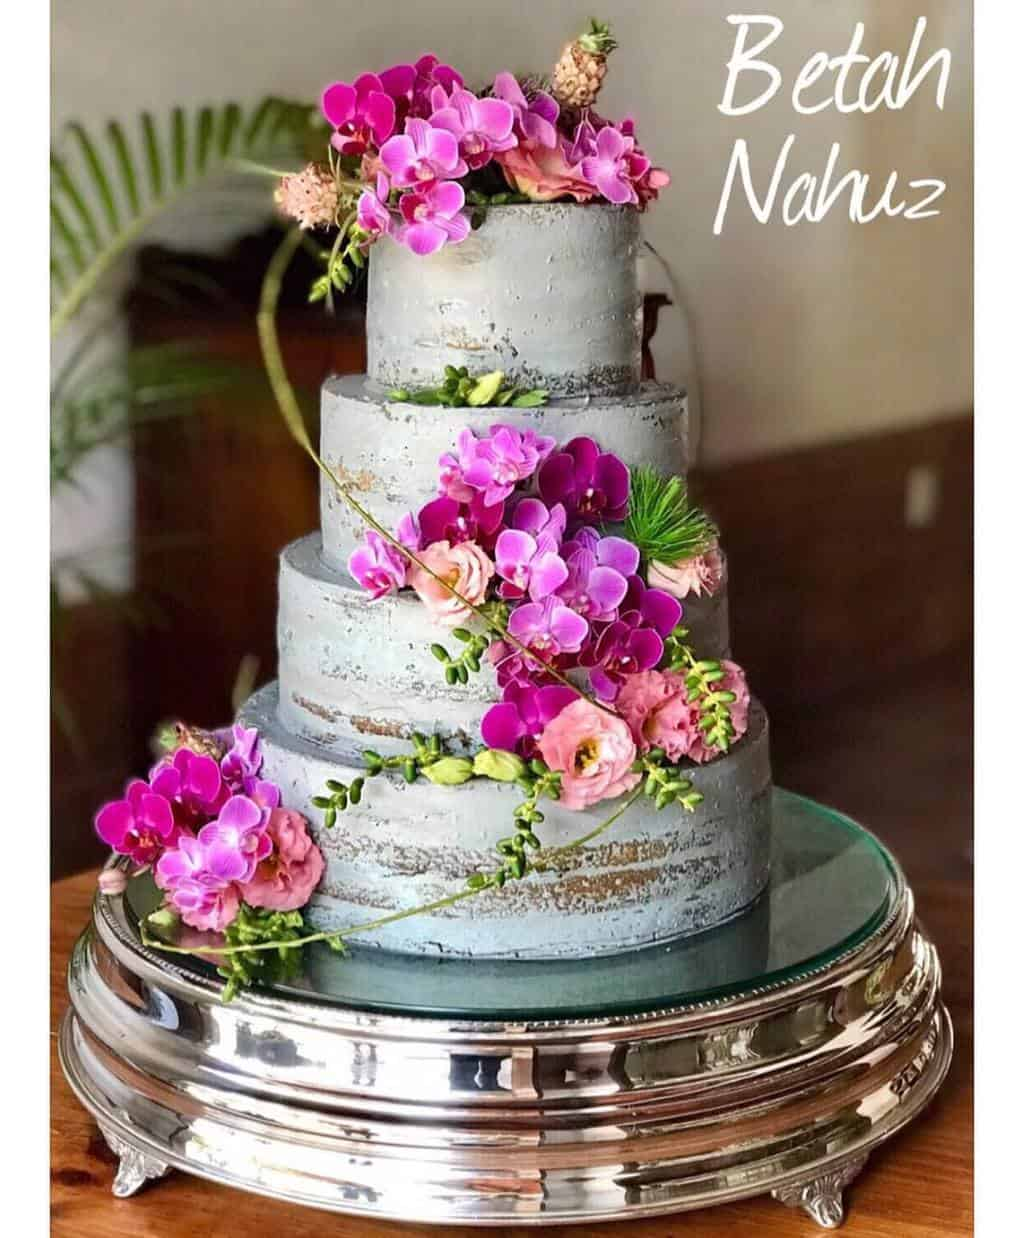 Concret-Cake-Betah-Nahuz